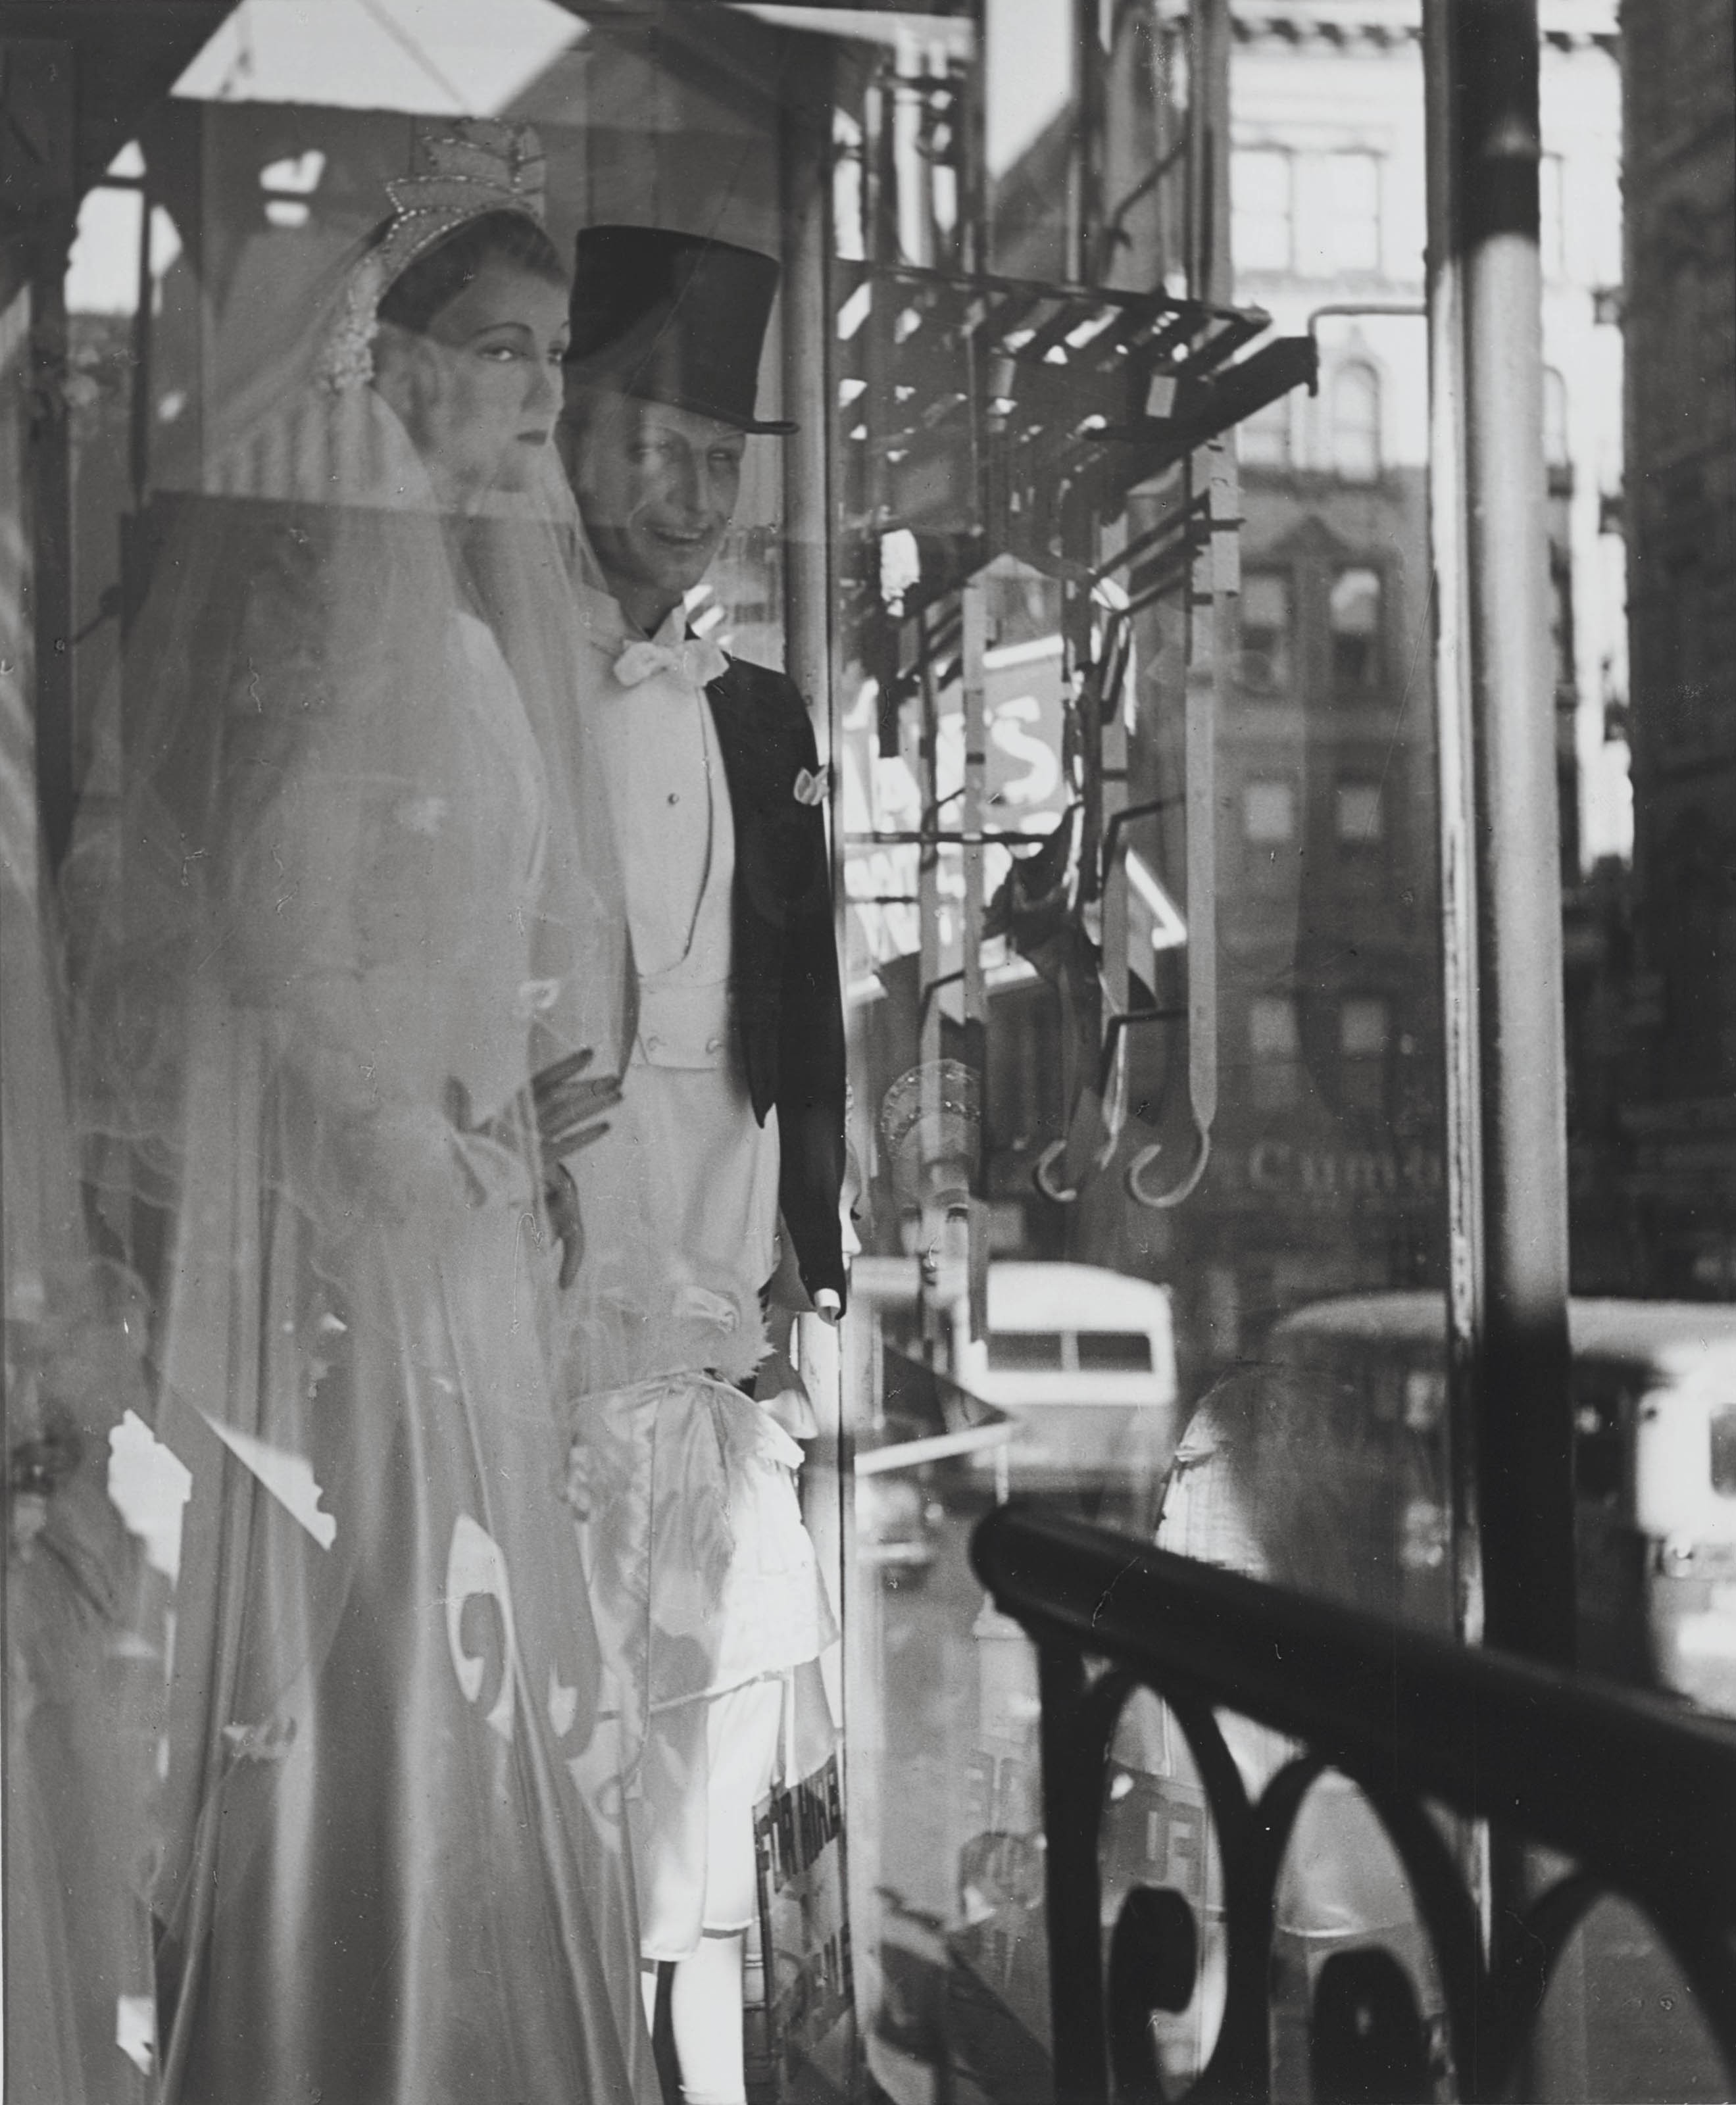 Window, Bridal Couple, New York, 1939-1945